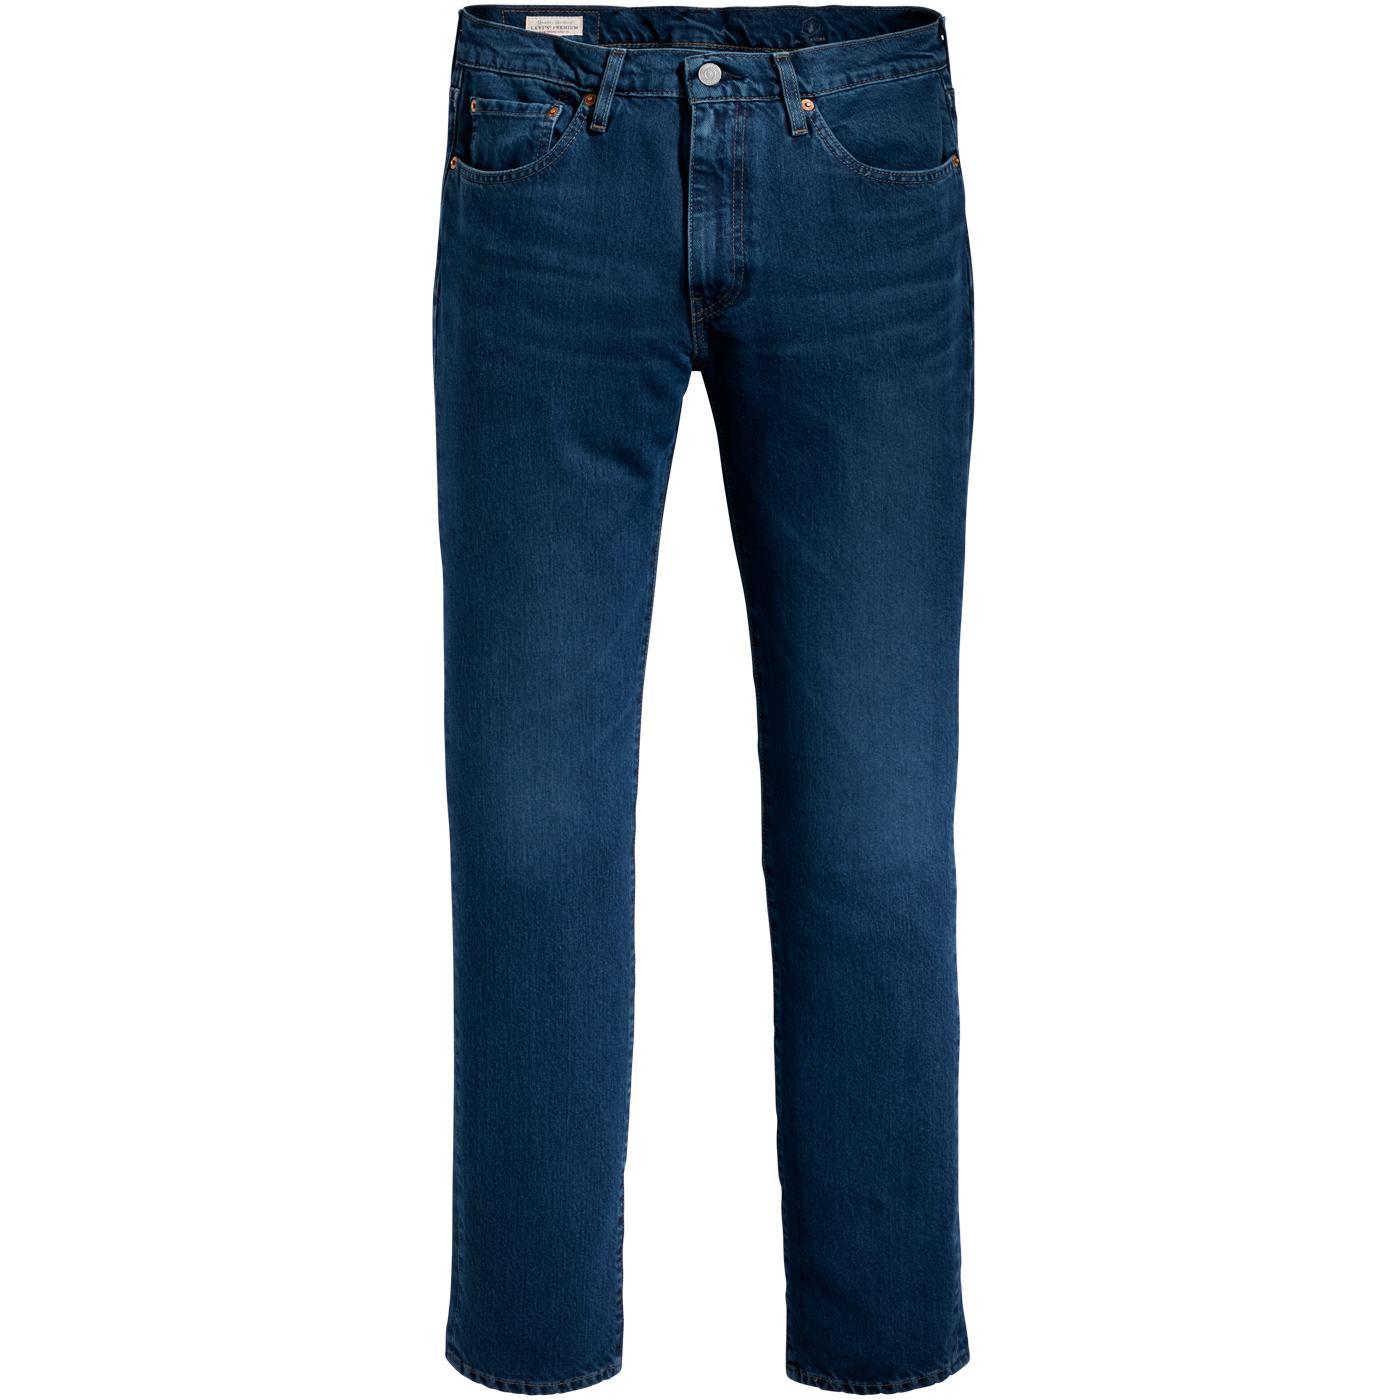 LEVI'S 511 Men's Slim Jeans (Manilla Leaves Adapt)